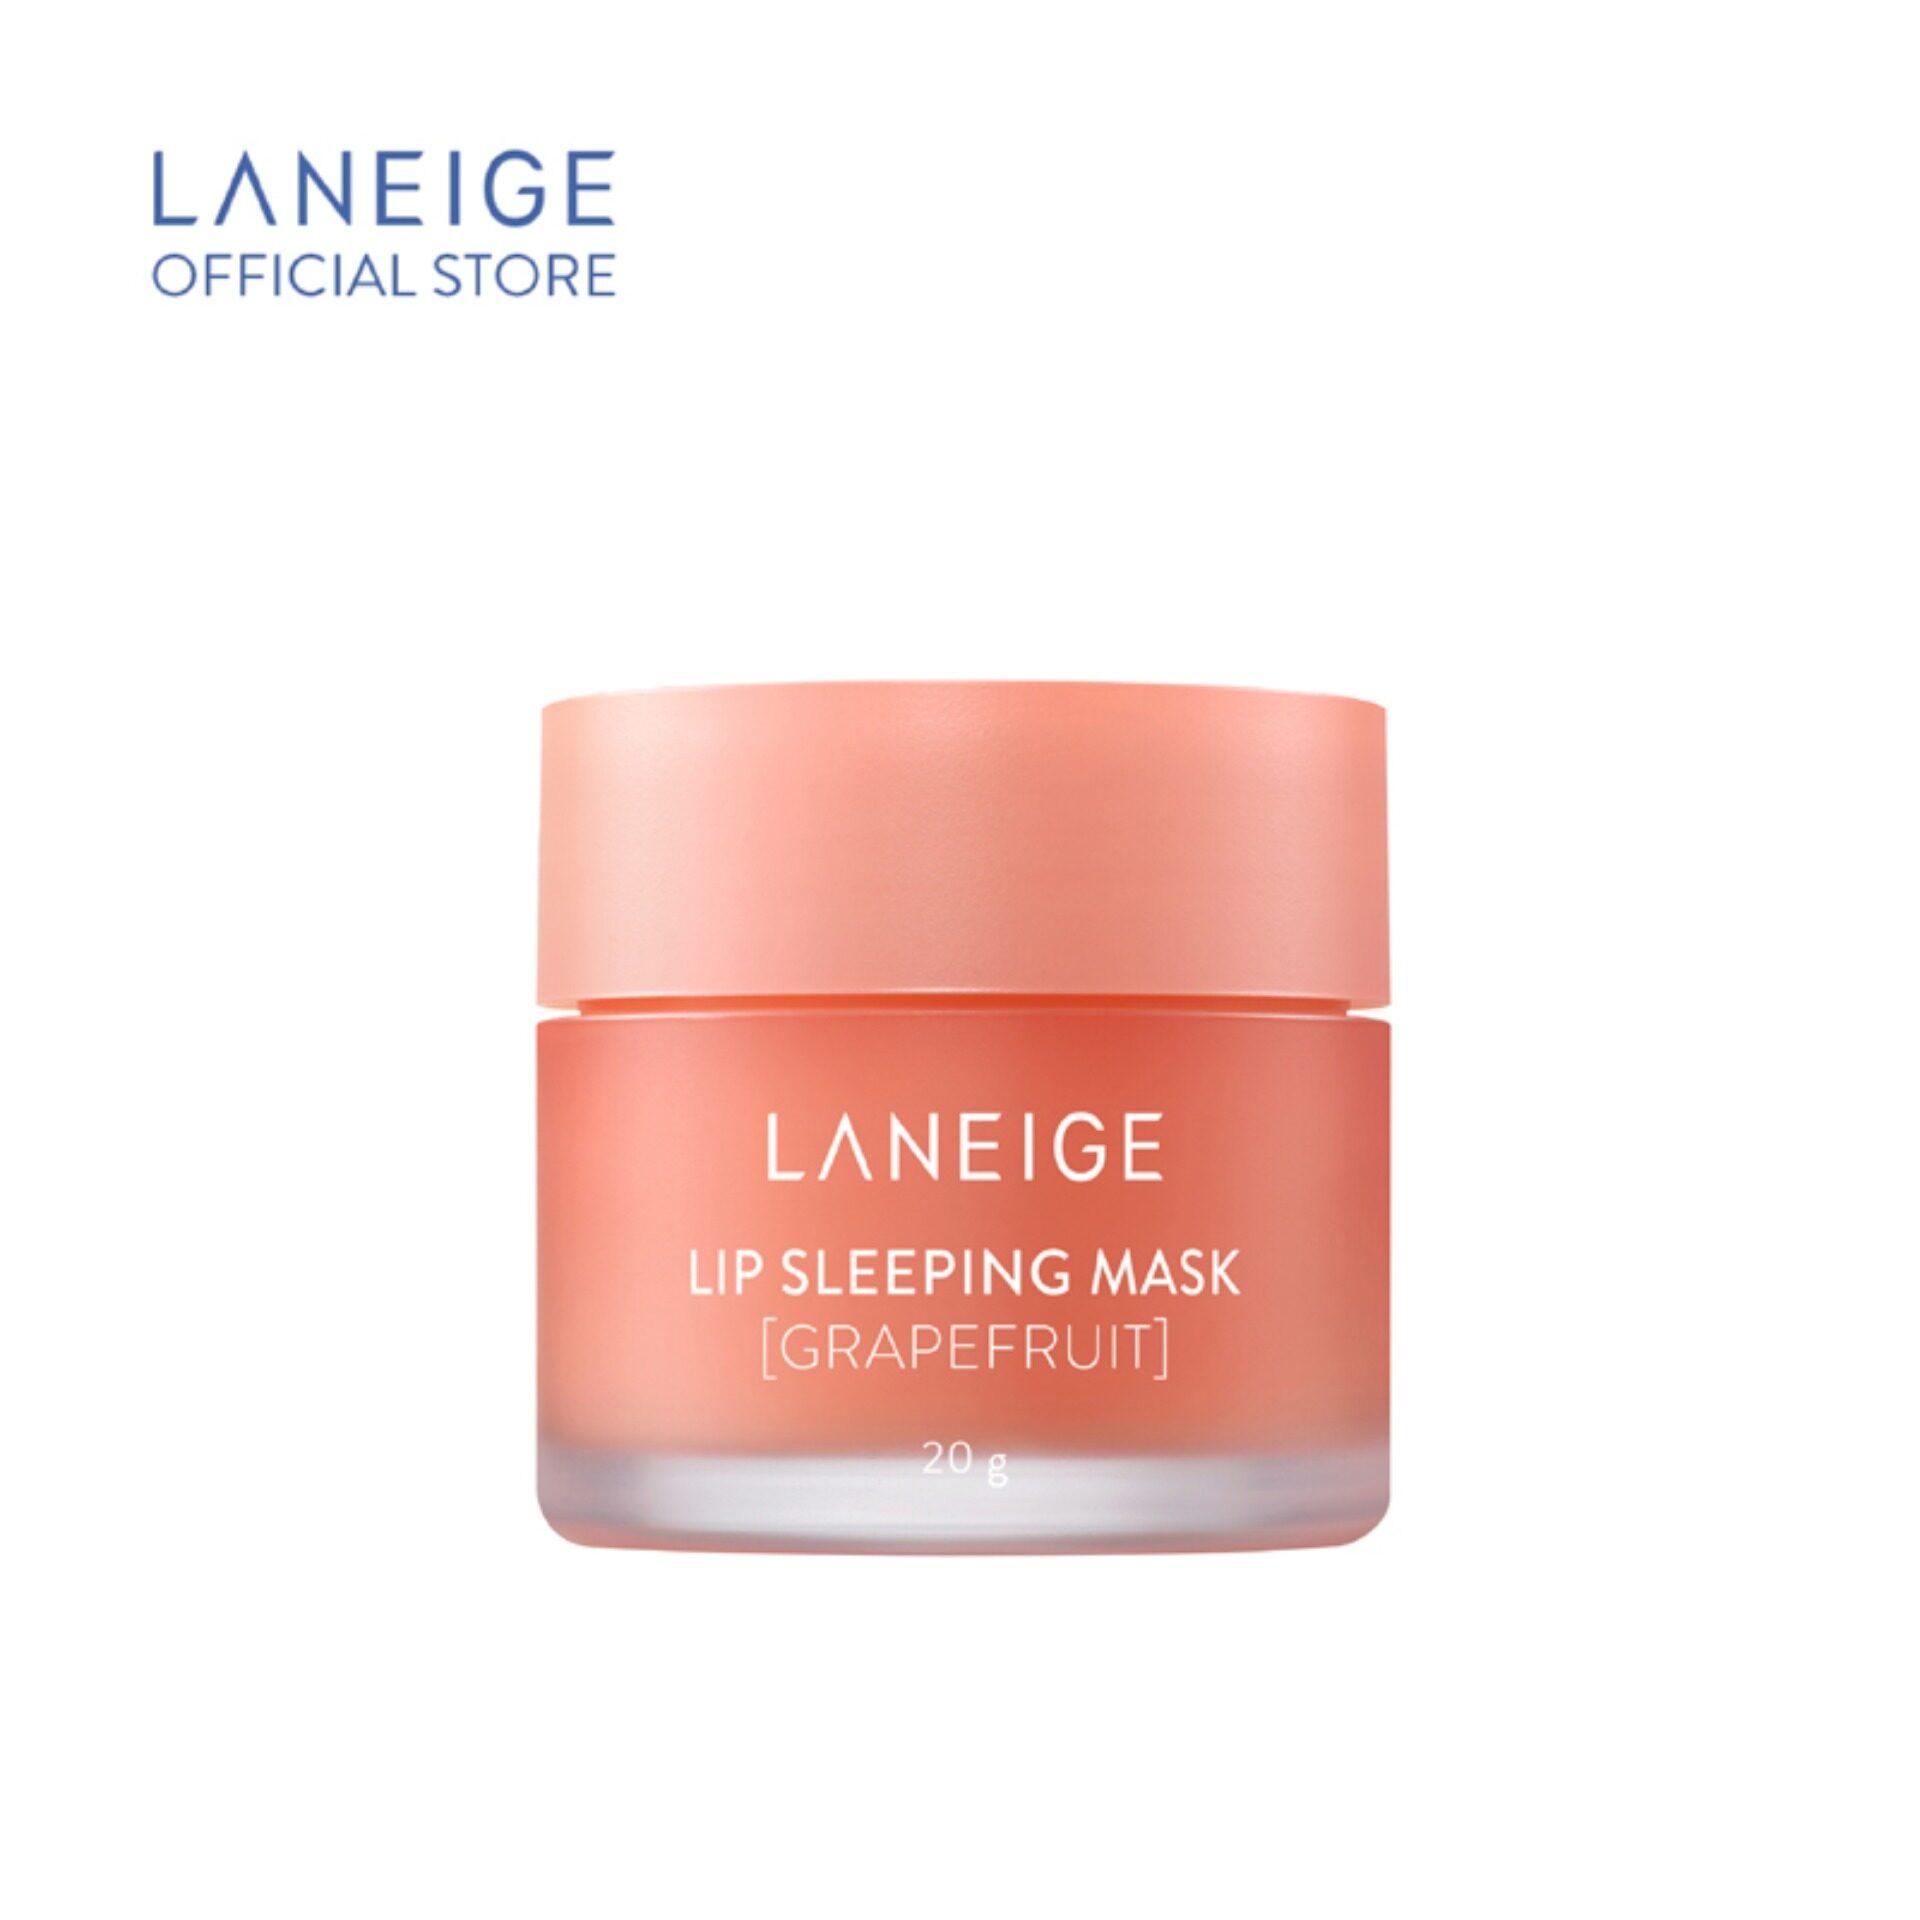 LANEIGE Lip Sleeping Mask (Grapefruit) (20G)